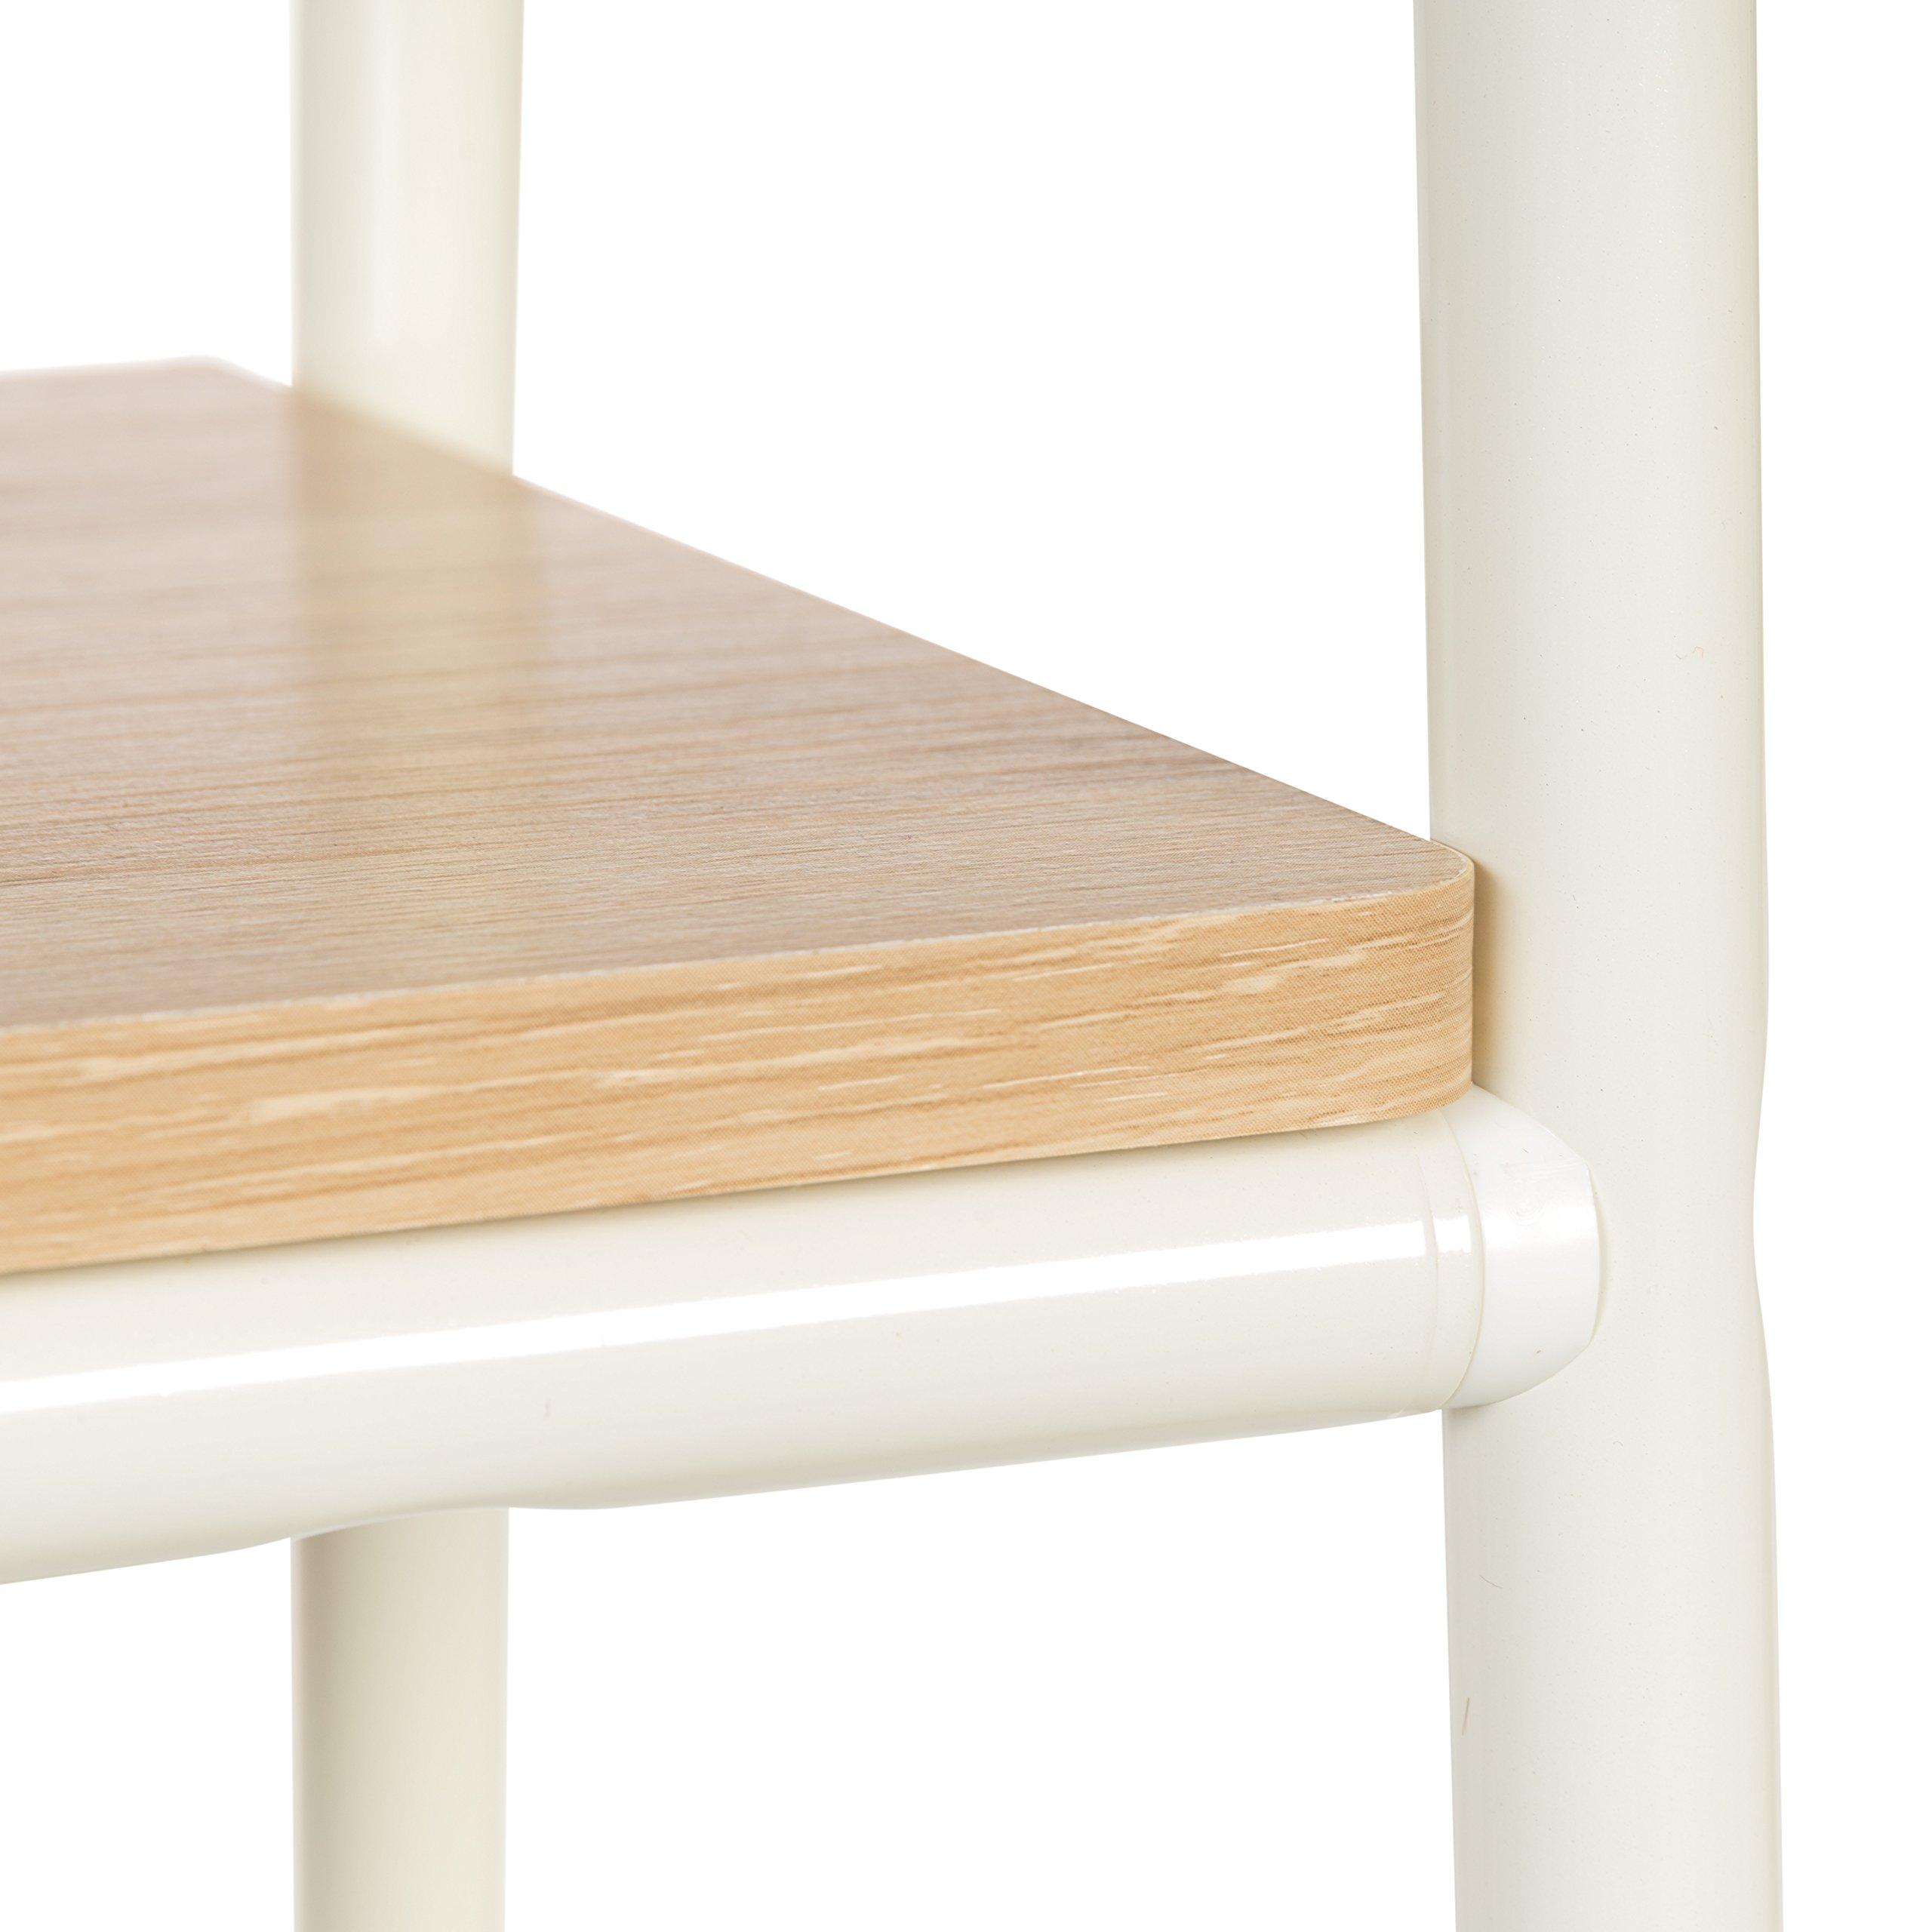 IRIS Metal Garment Rack with 2 Wood Shelves, White and Light Brown by IRIS USA, Inc. (Image #2)